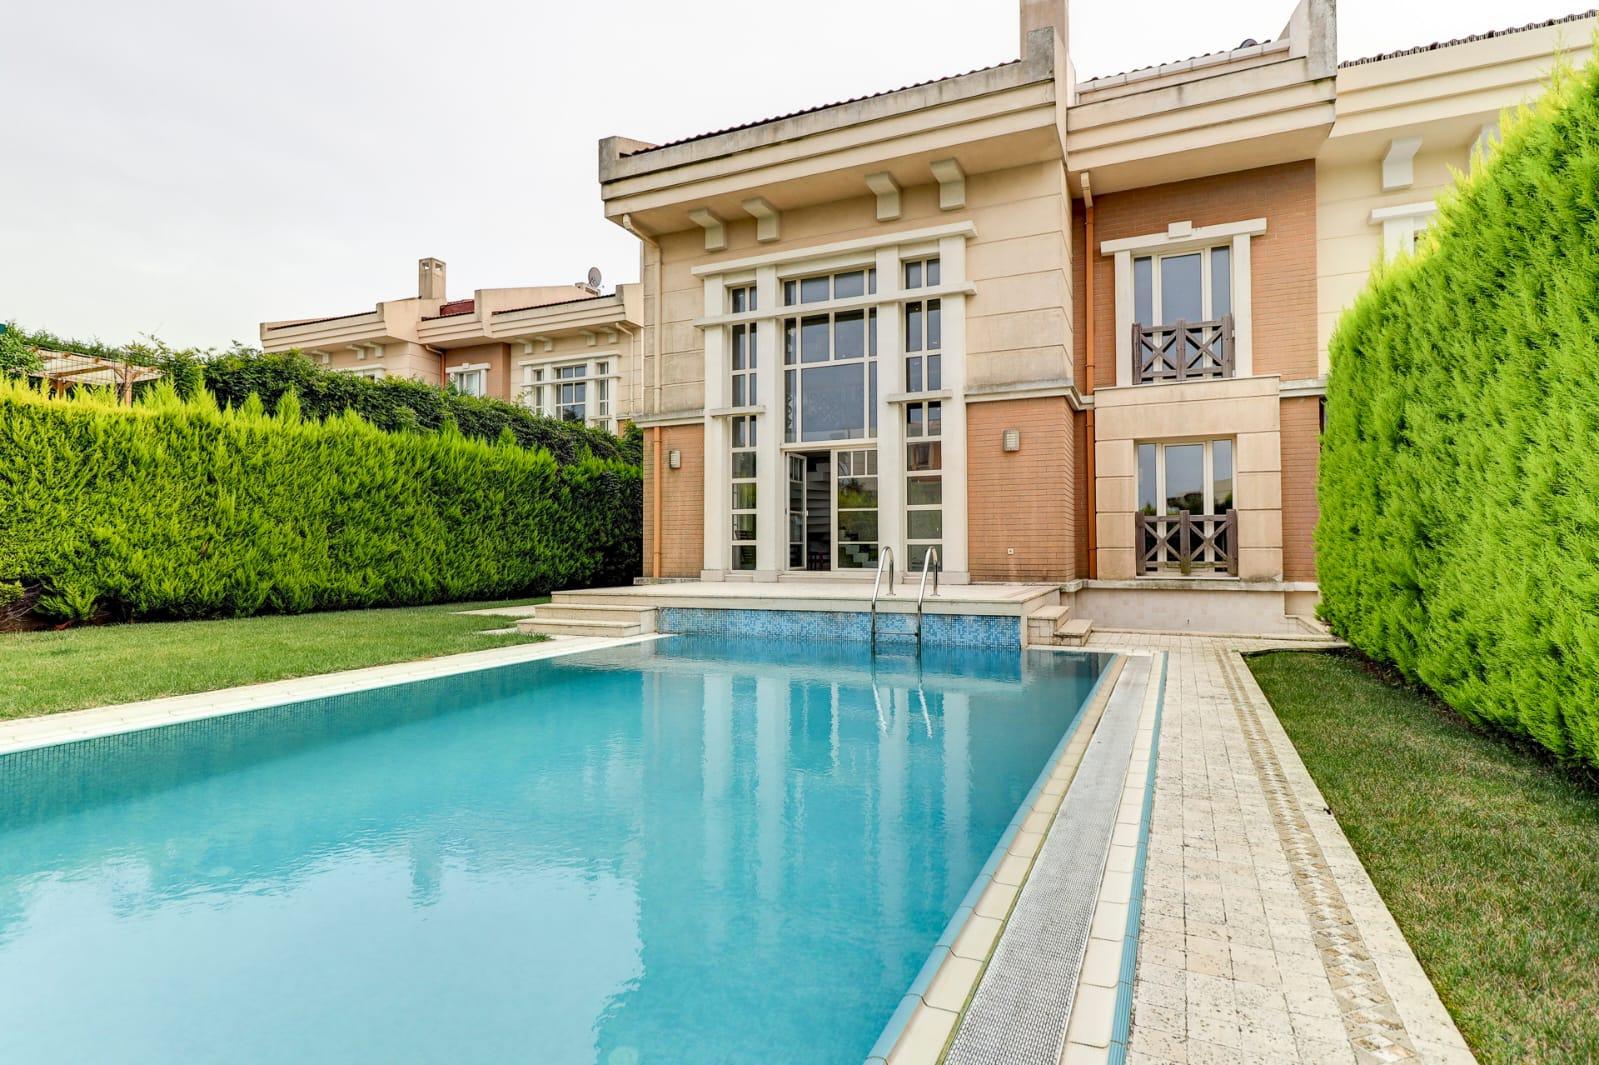 kilyos-villa-istanbul-property001-1.jpg